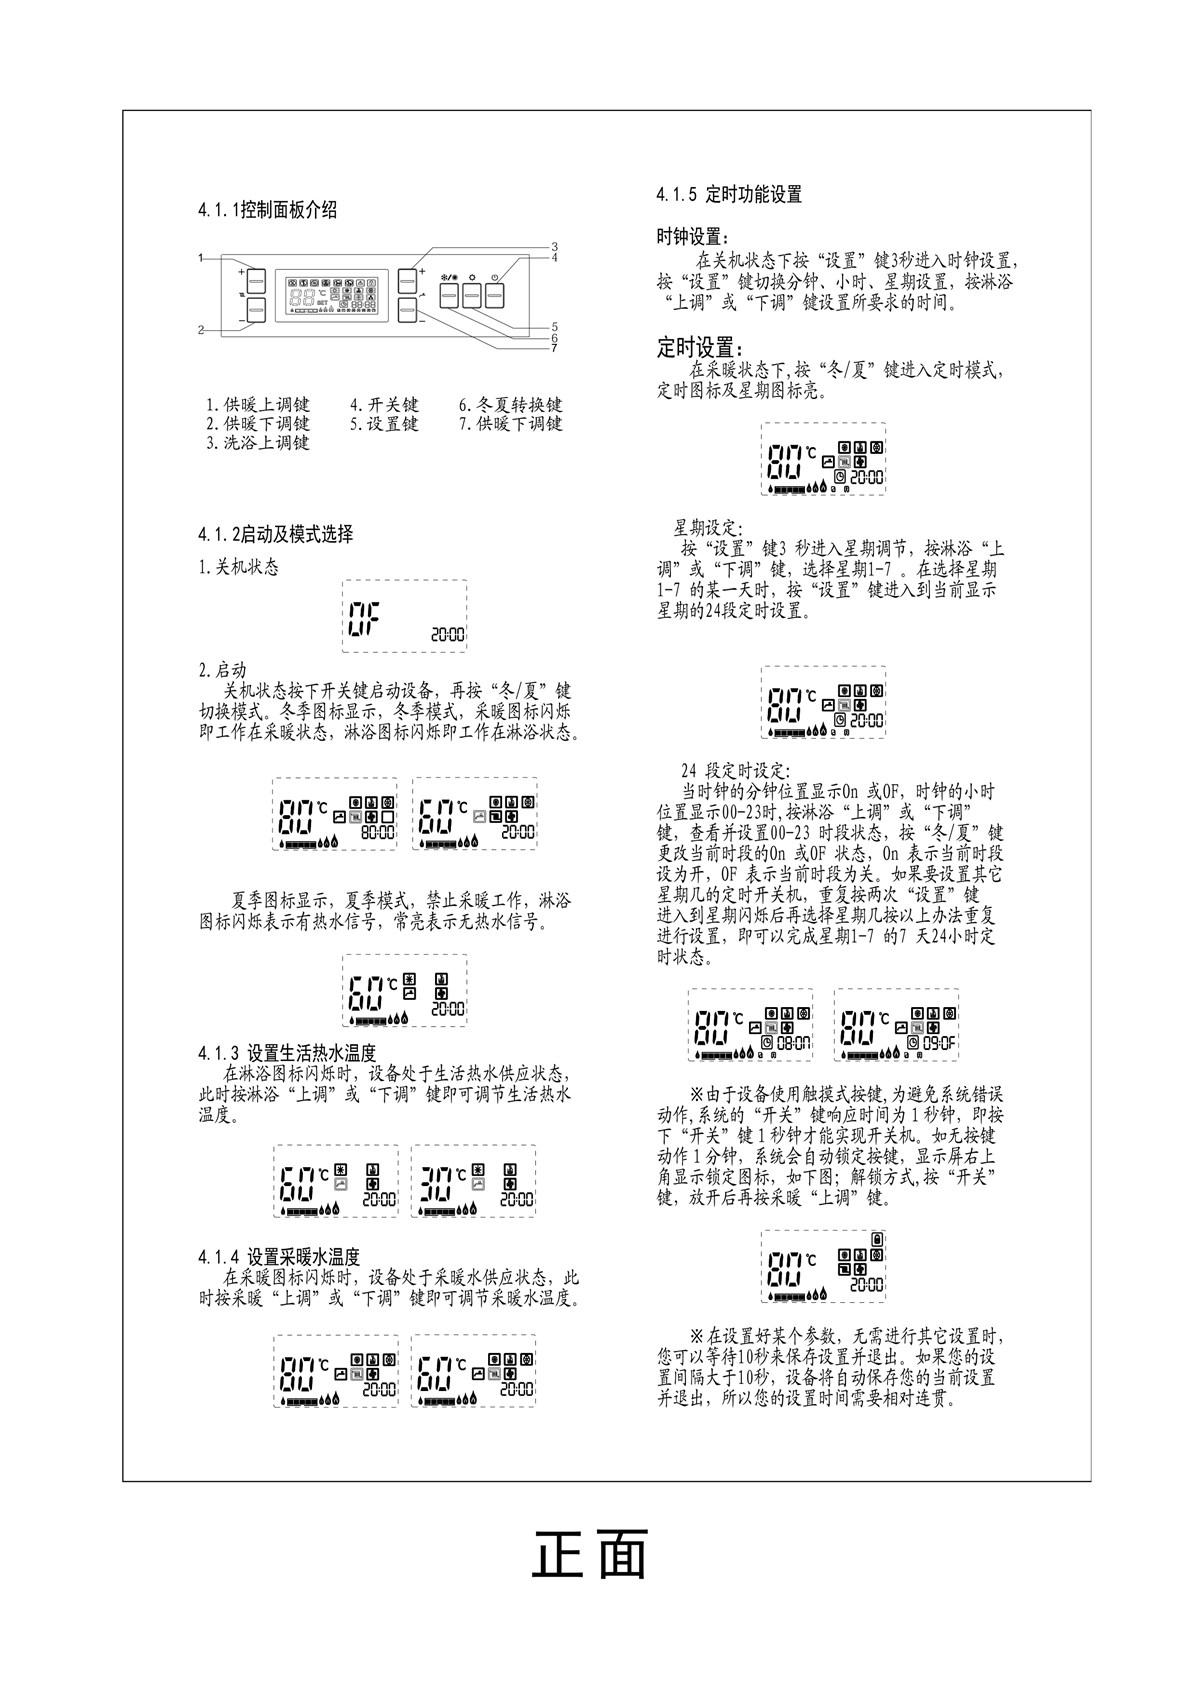 ES16B系列-用户使用手册-10_01.jpg